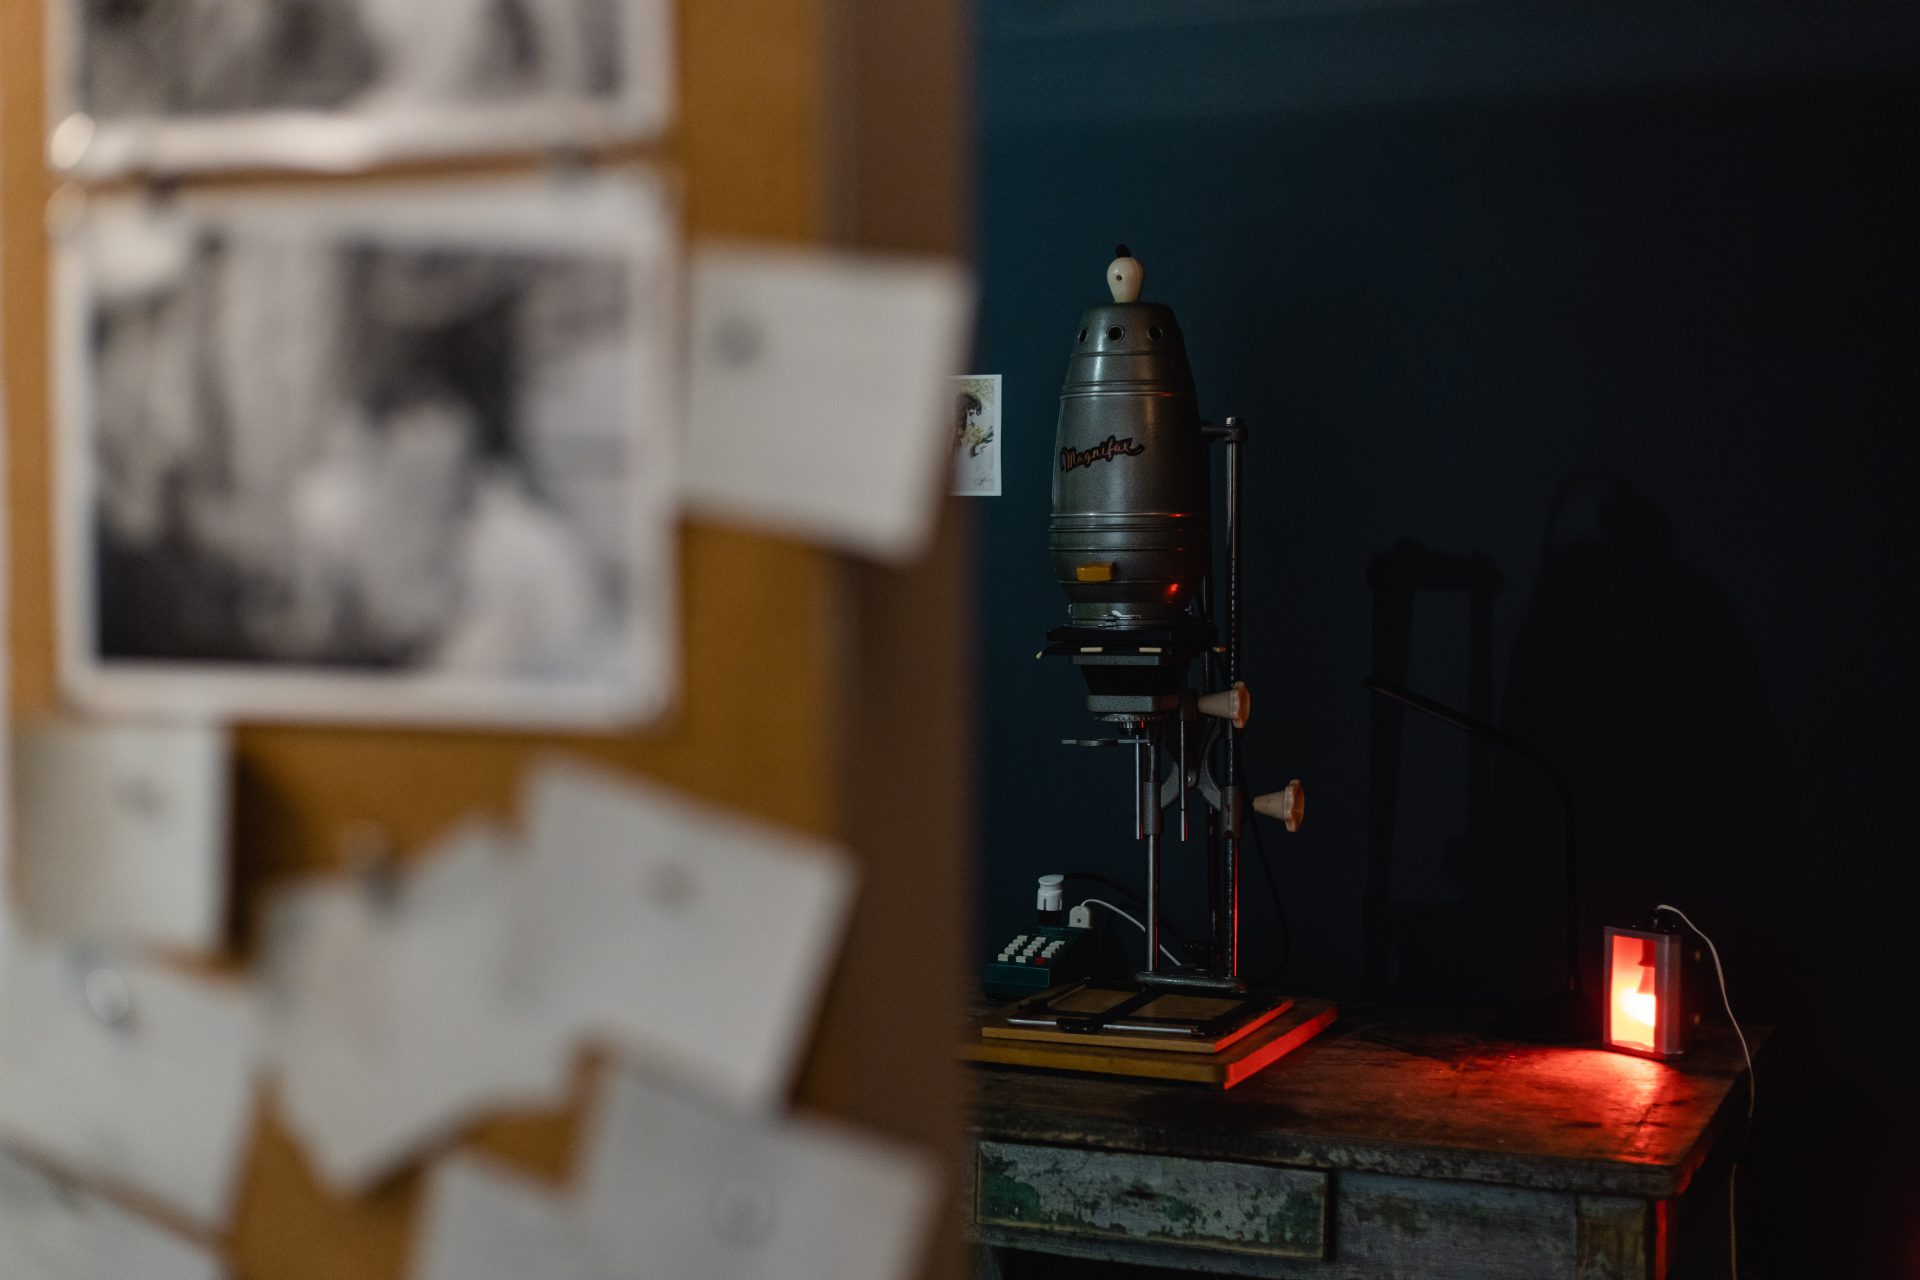 A Blue Dye of Frantsuzov. A Workshop in Analog Photography